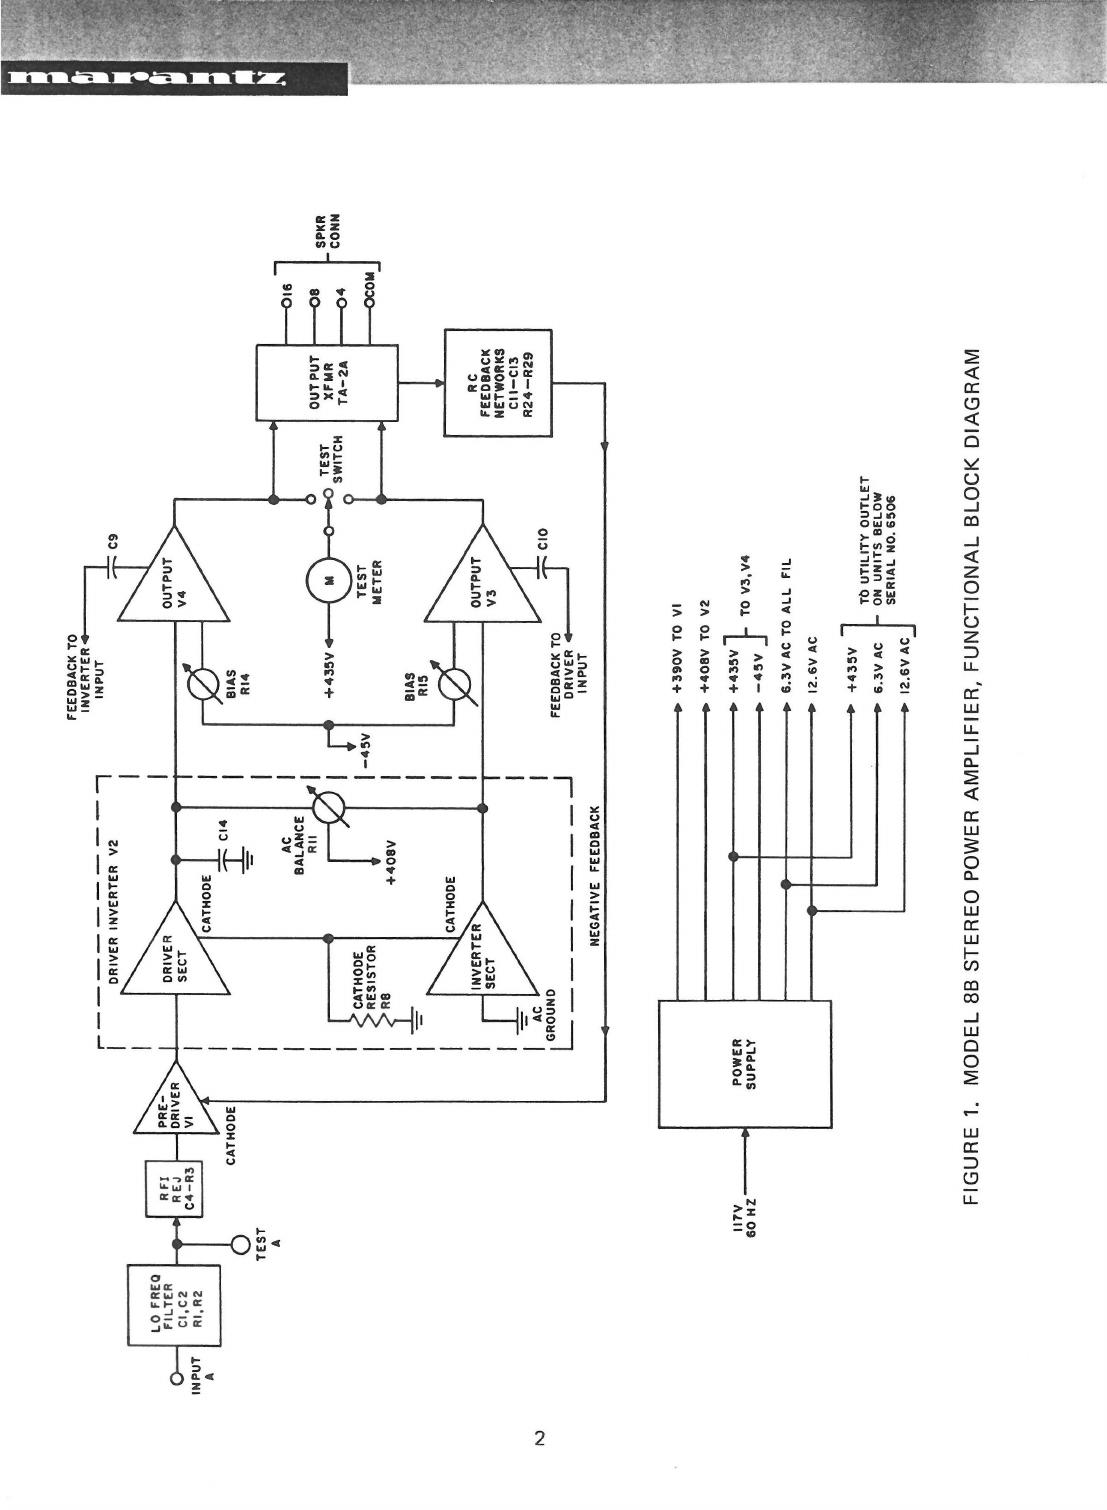 Service Manual Marantz 8B on marantz 8b amplifier, fisher x 1000 schematic, mcintosh mc275 schematic, marantz 8b power supply,